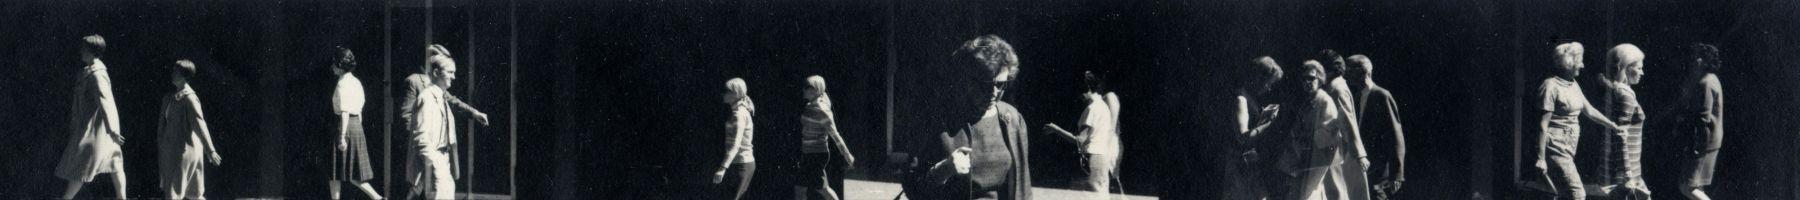 Ray Metzker Striptease